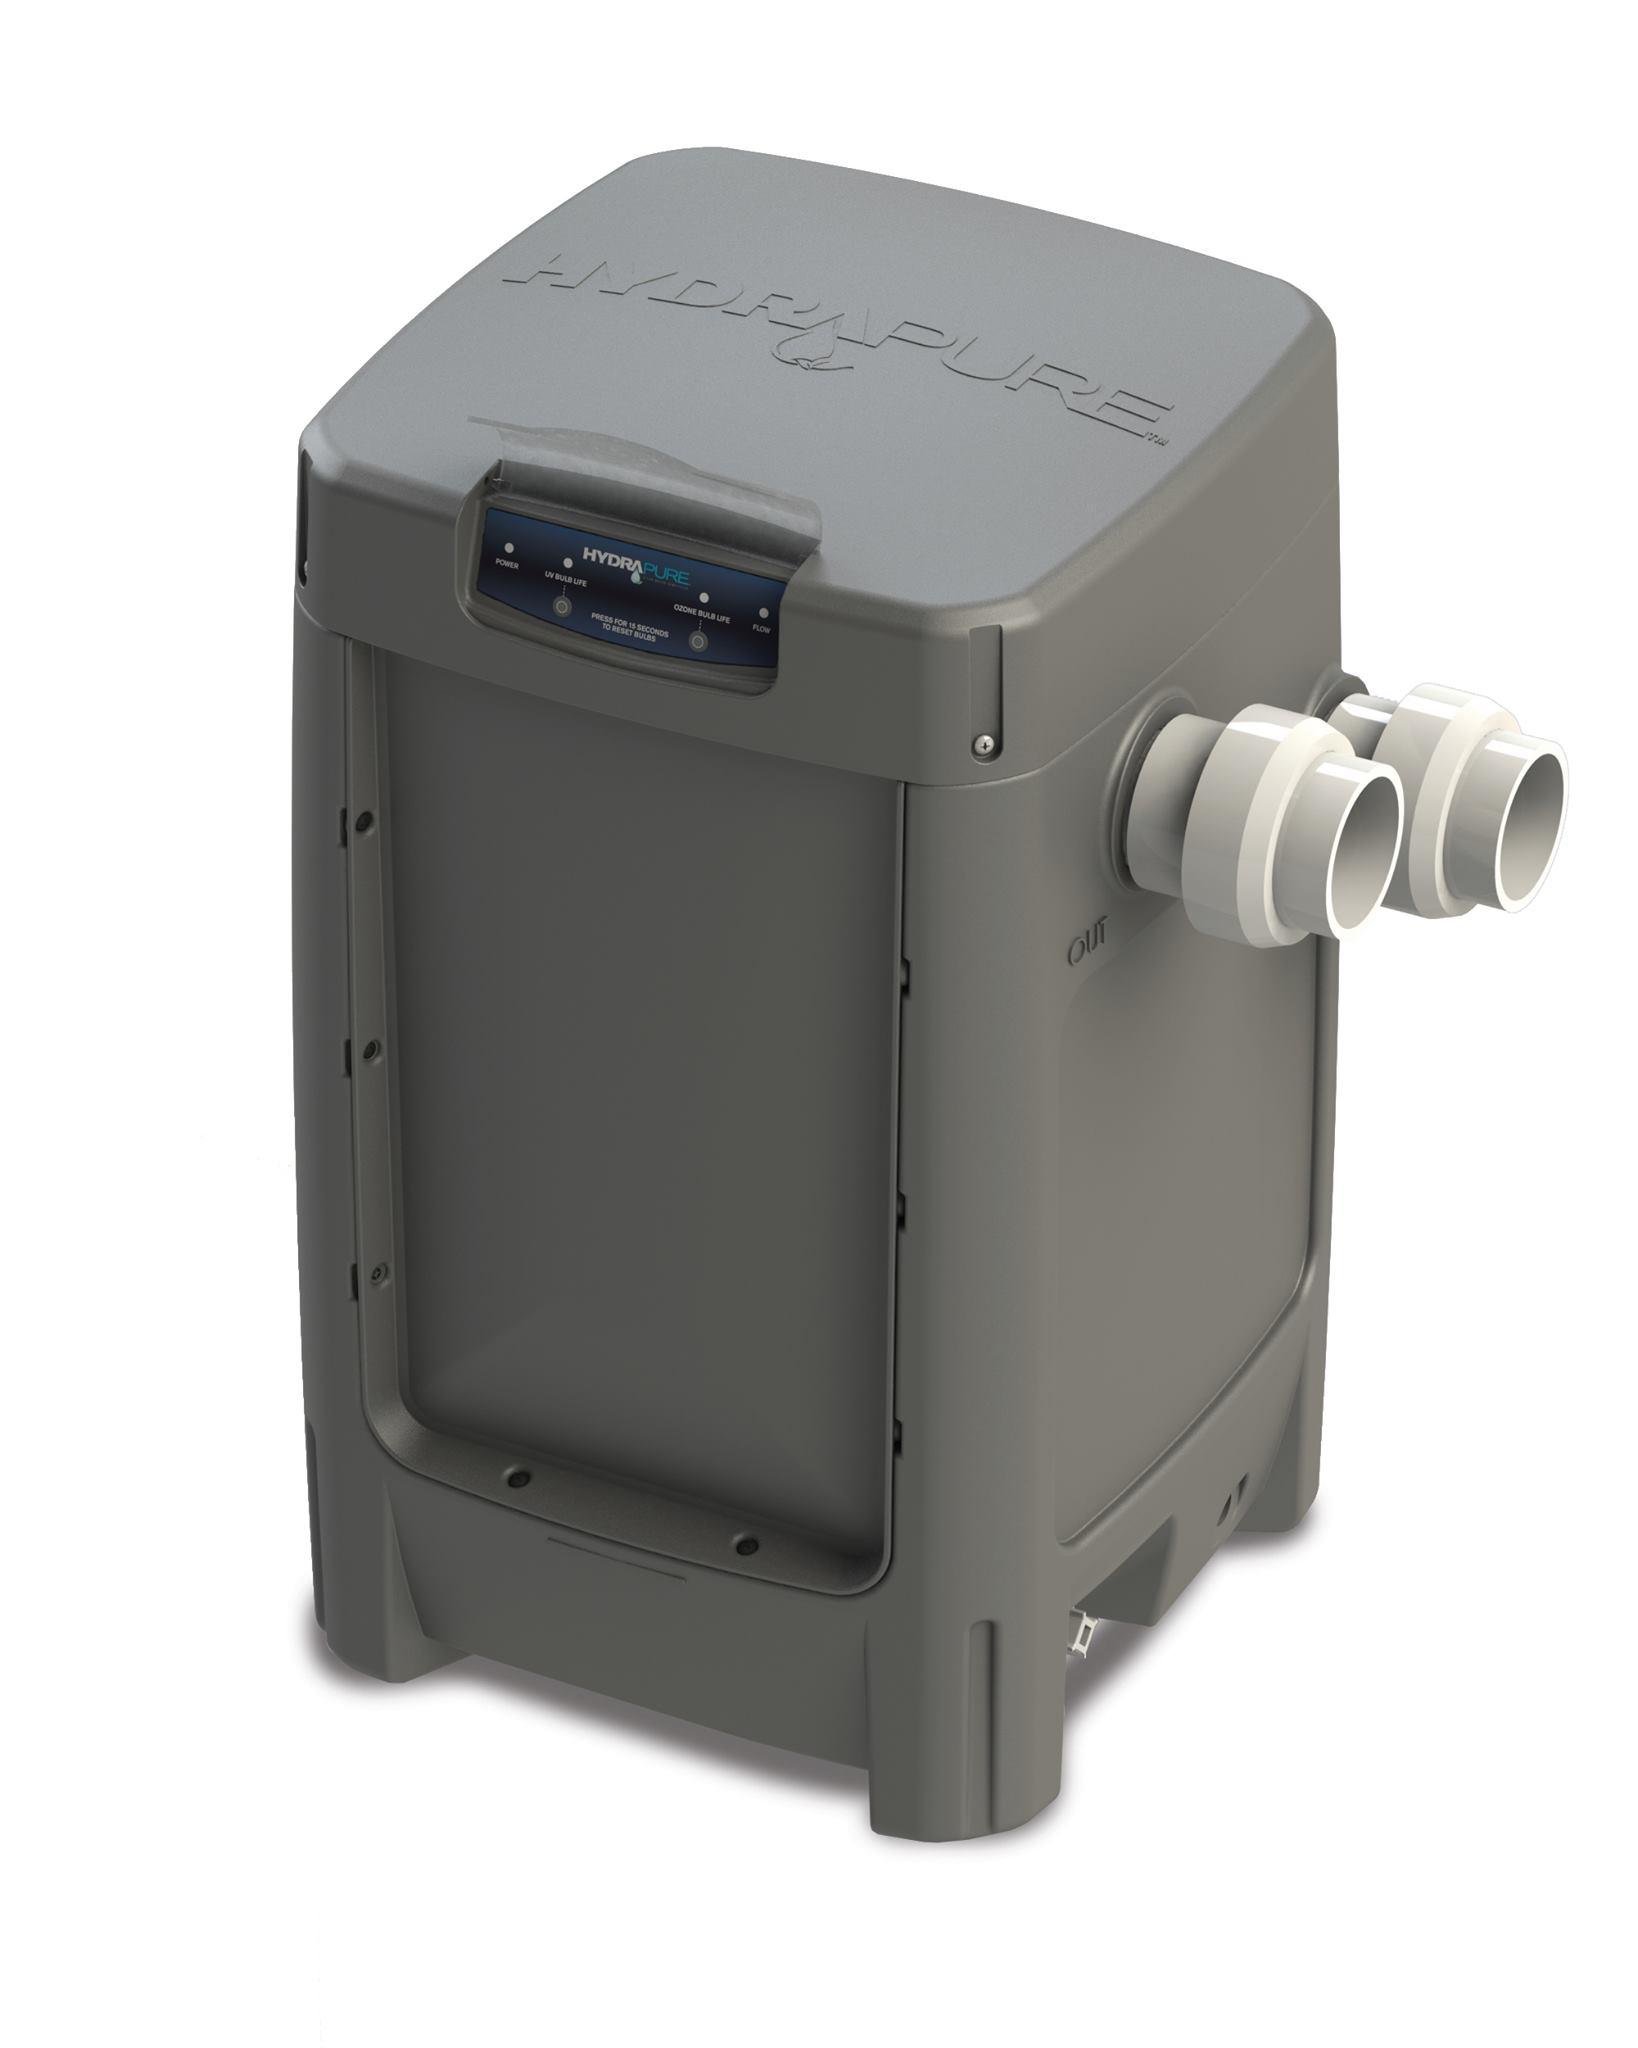 HydraPure Advanced Oxidation Sanitization System